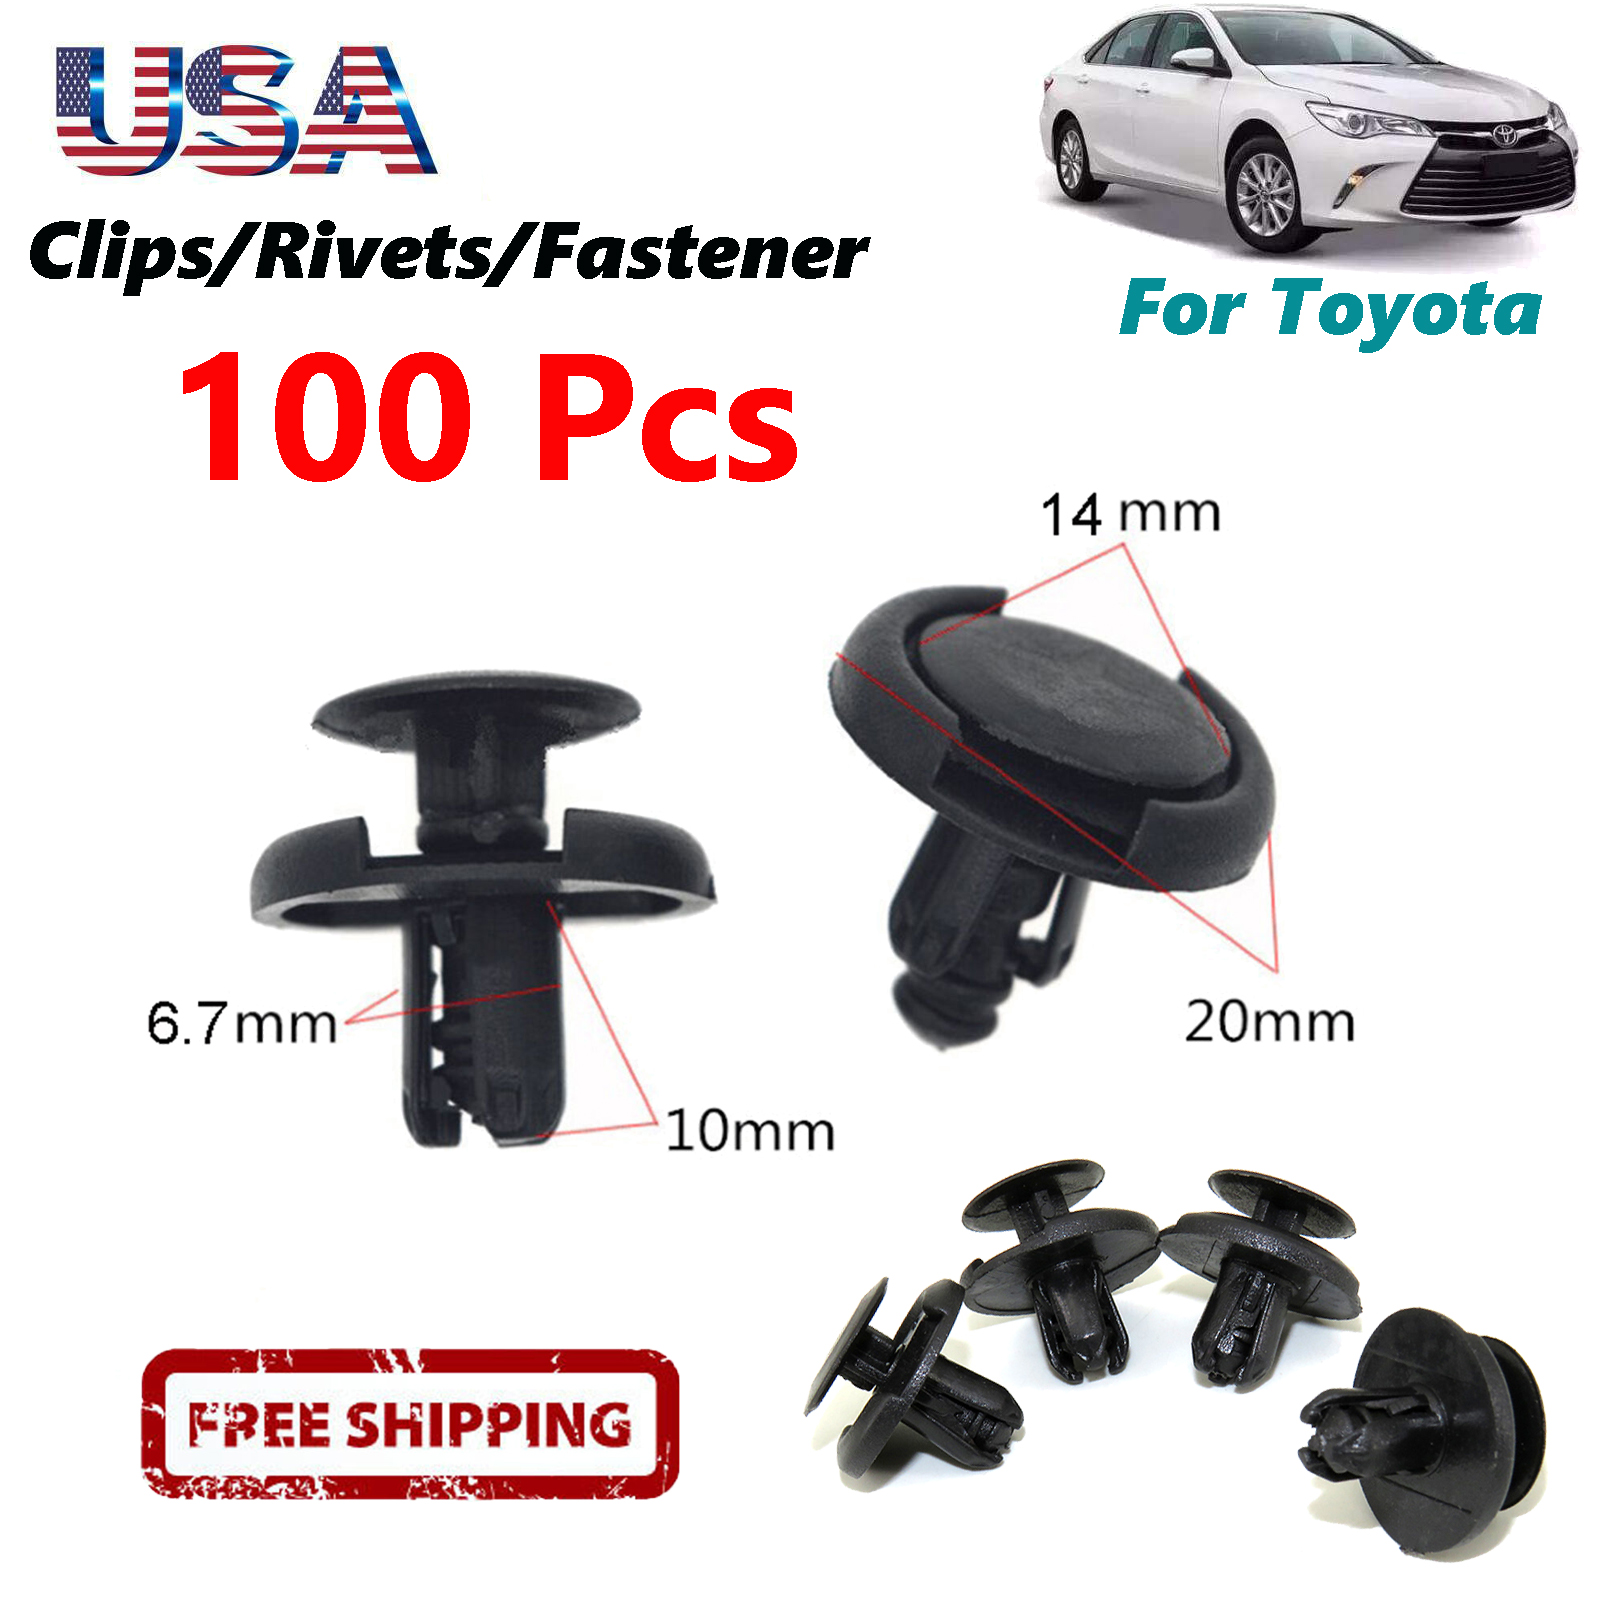 100Pcs Push Clips Fastener Rivets Fender Liner Retainer 7mm Hole Dia For Toyota